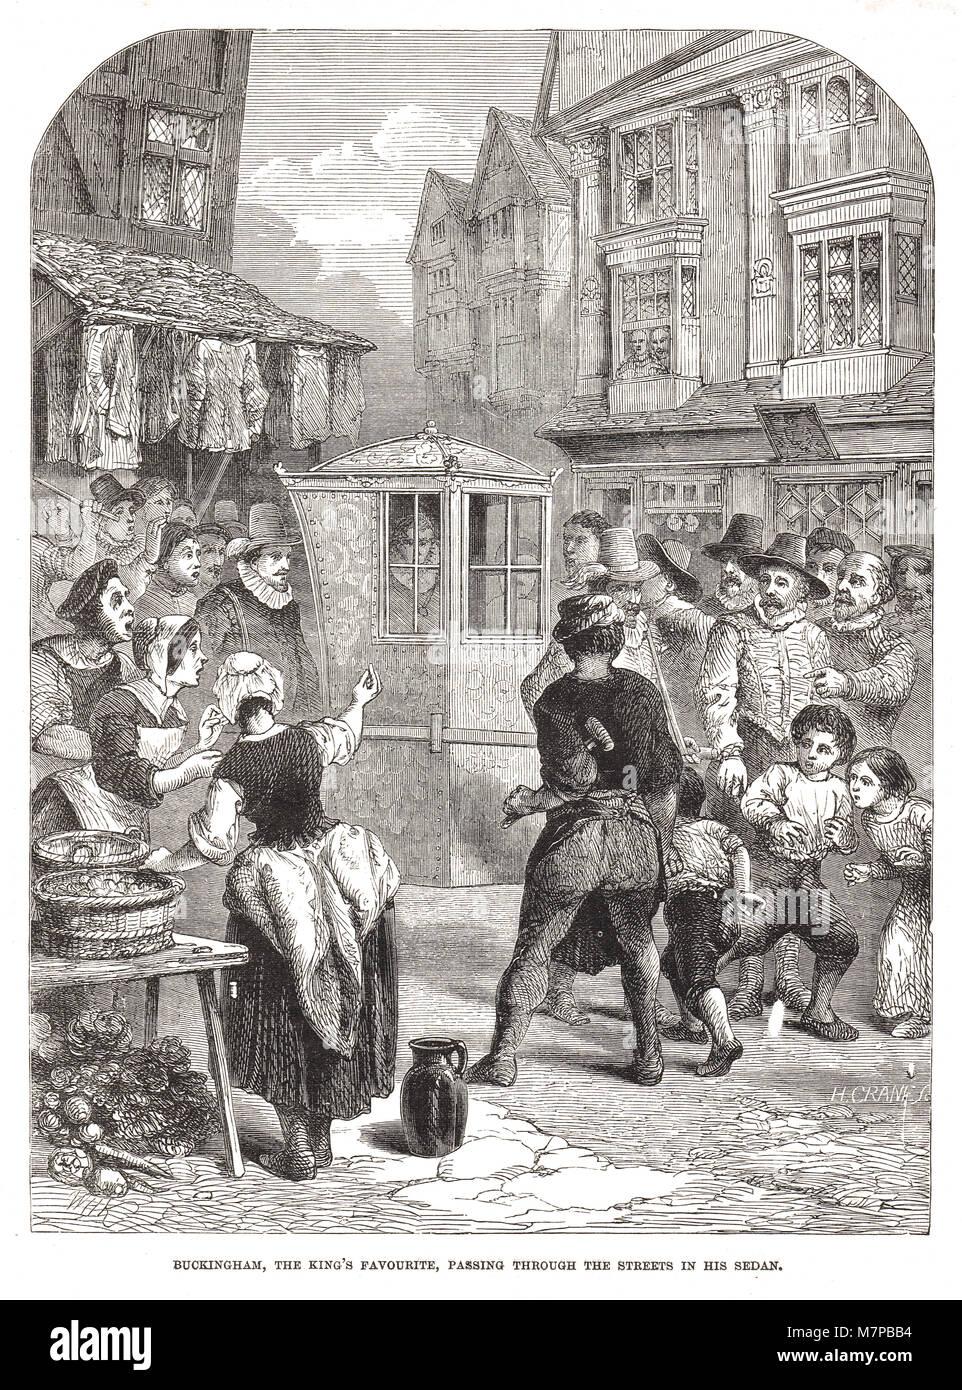 George Villiers, 1st Duke of Buckingham, riding in his Sedan, through streets of London, England, 17th century - Stock Image